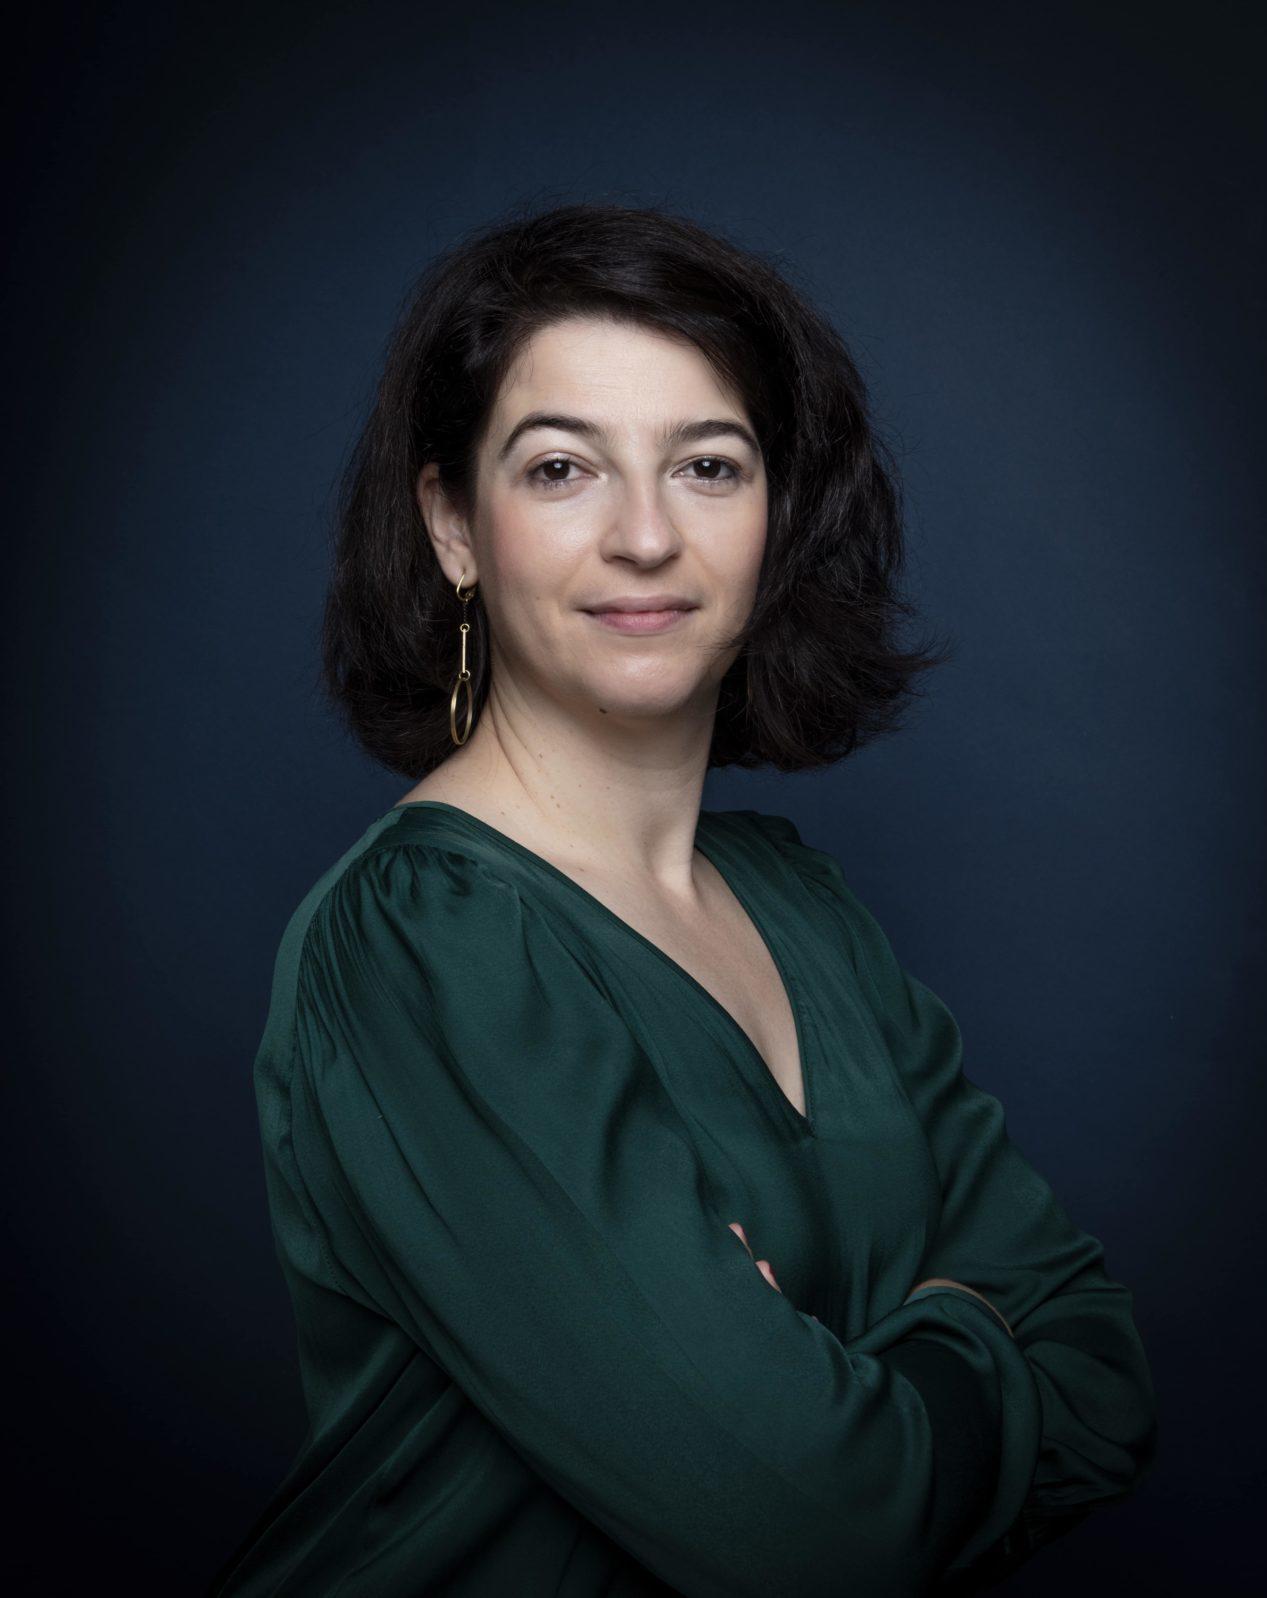 Elissaveta PETKOVA © Atelier Gallien / Échos Judiciaires Girondins